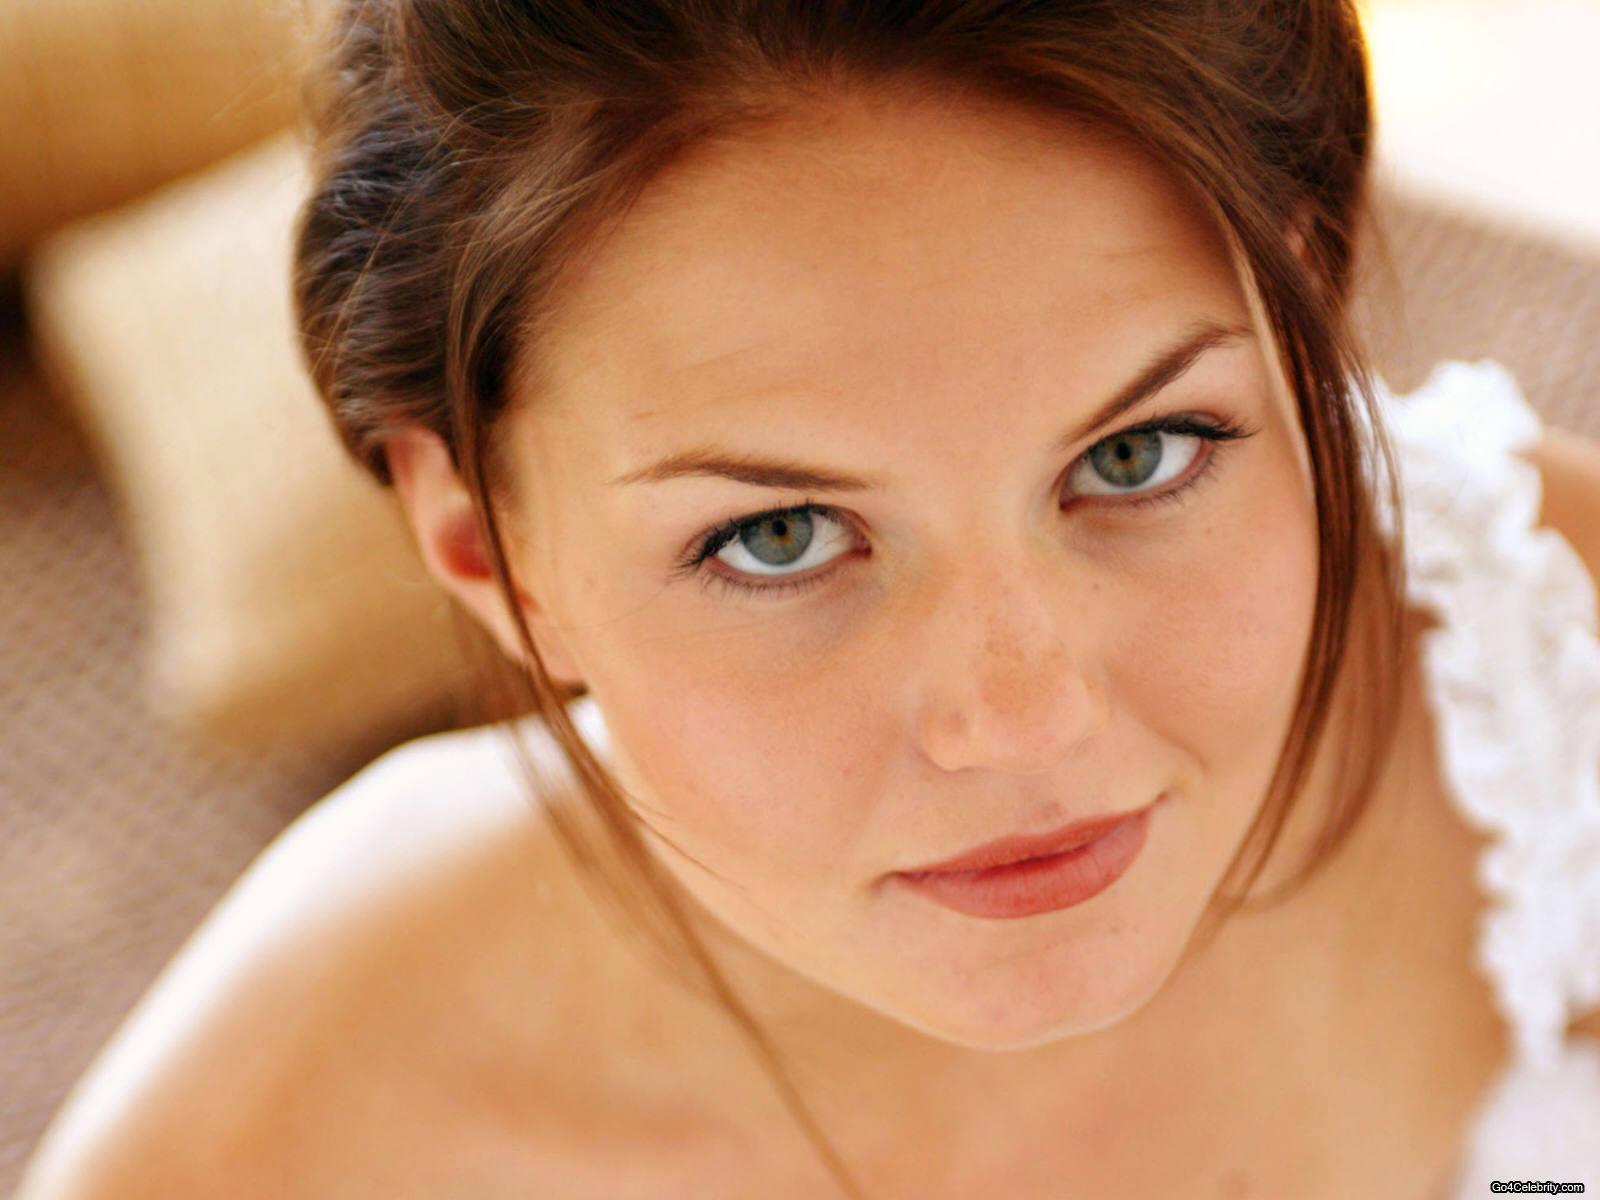 Jennifer Morrison | Celebrities lists. Bradley Cooper Movies